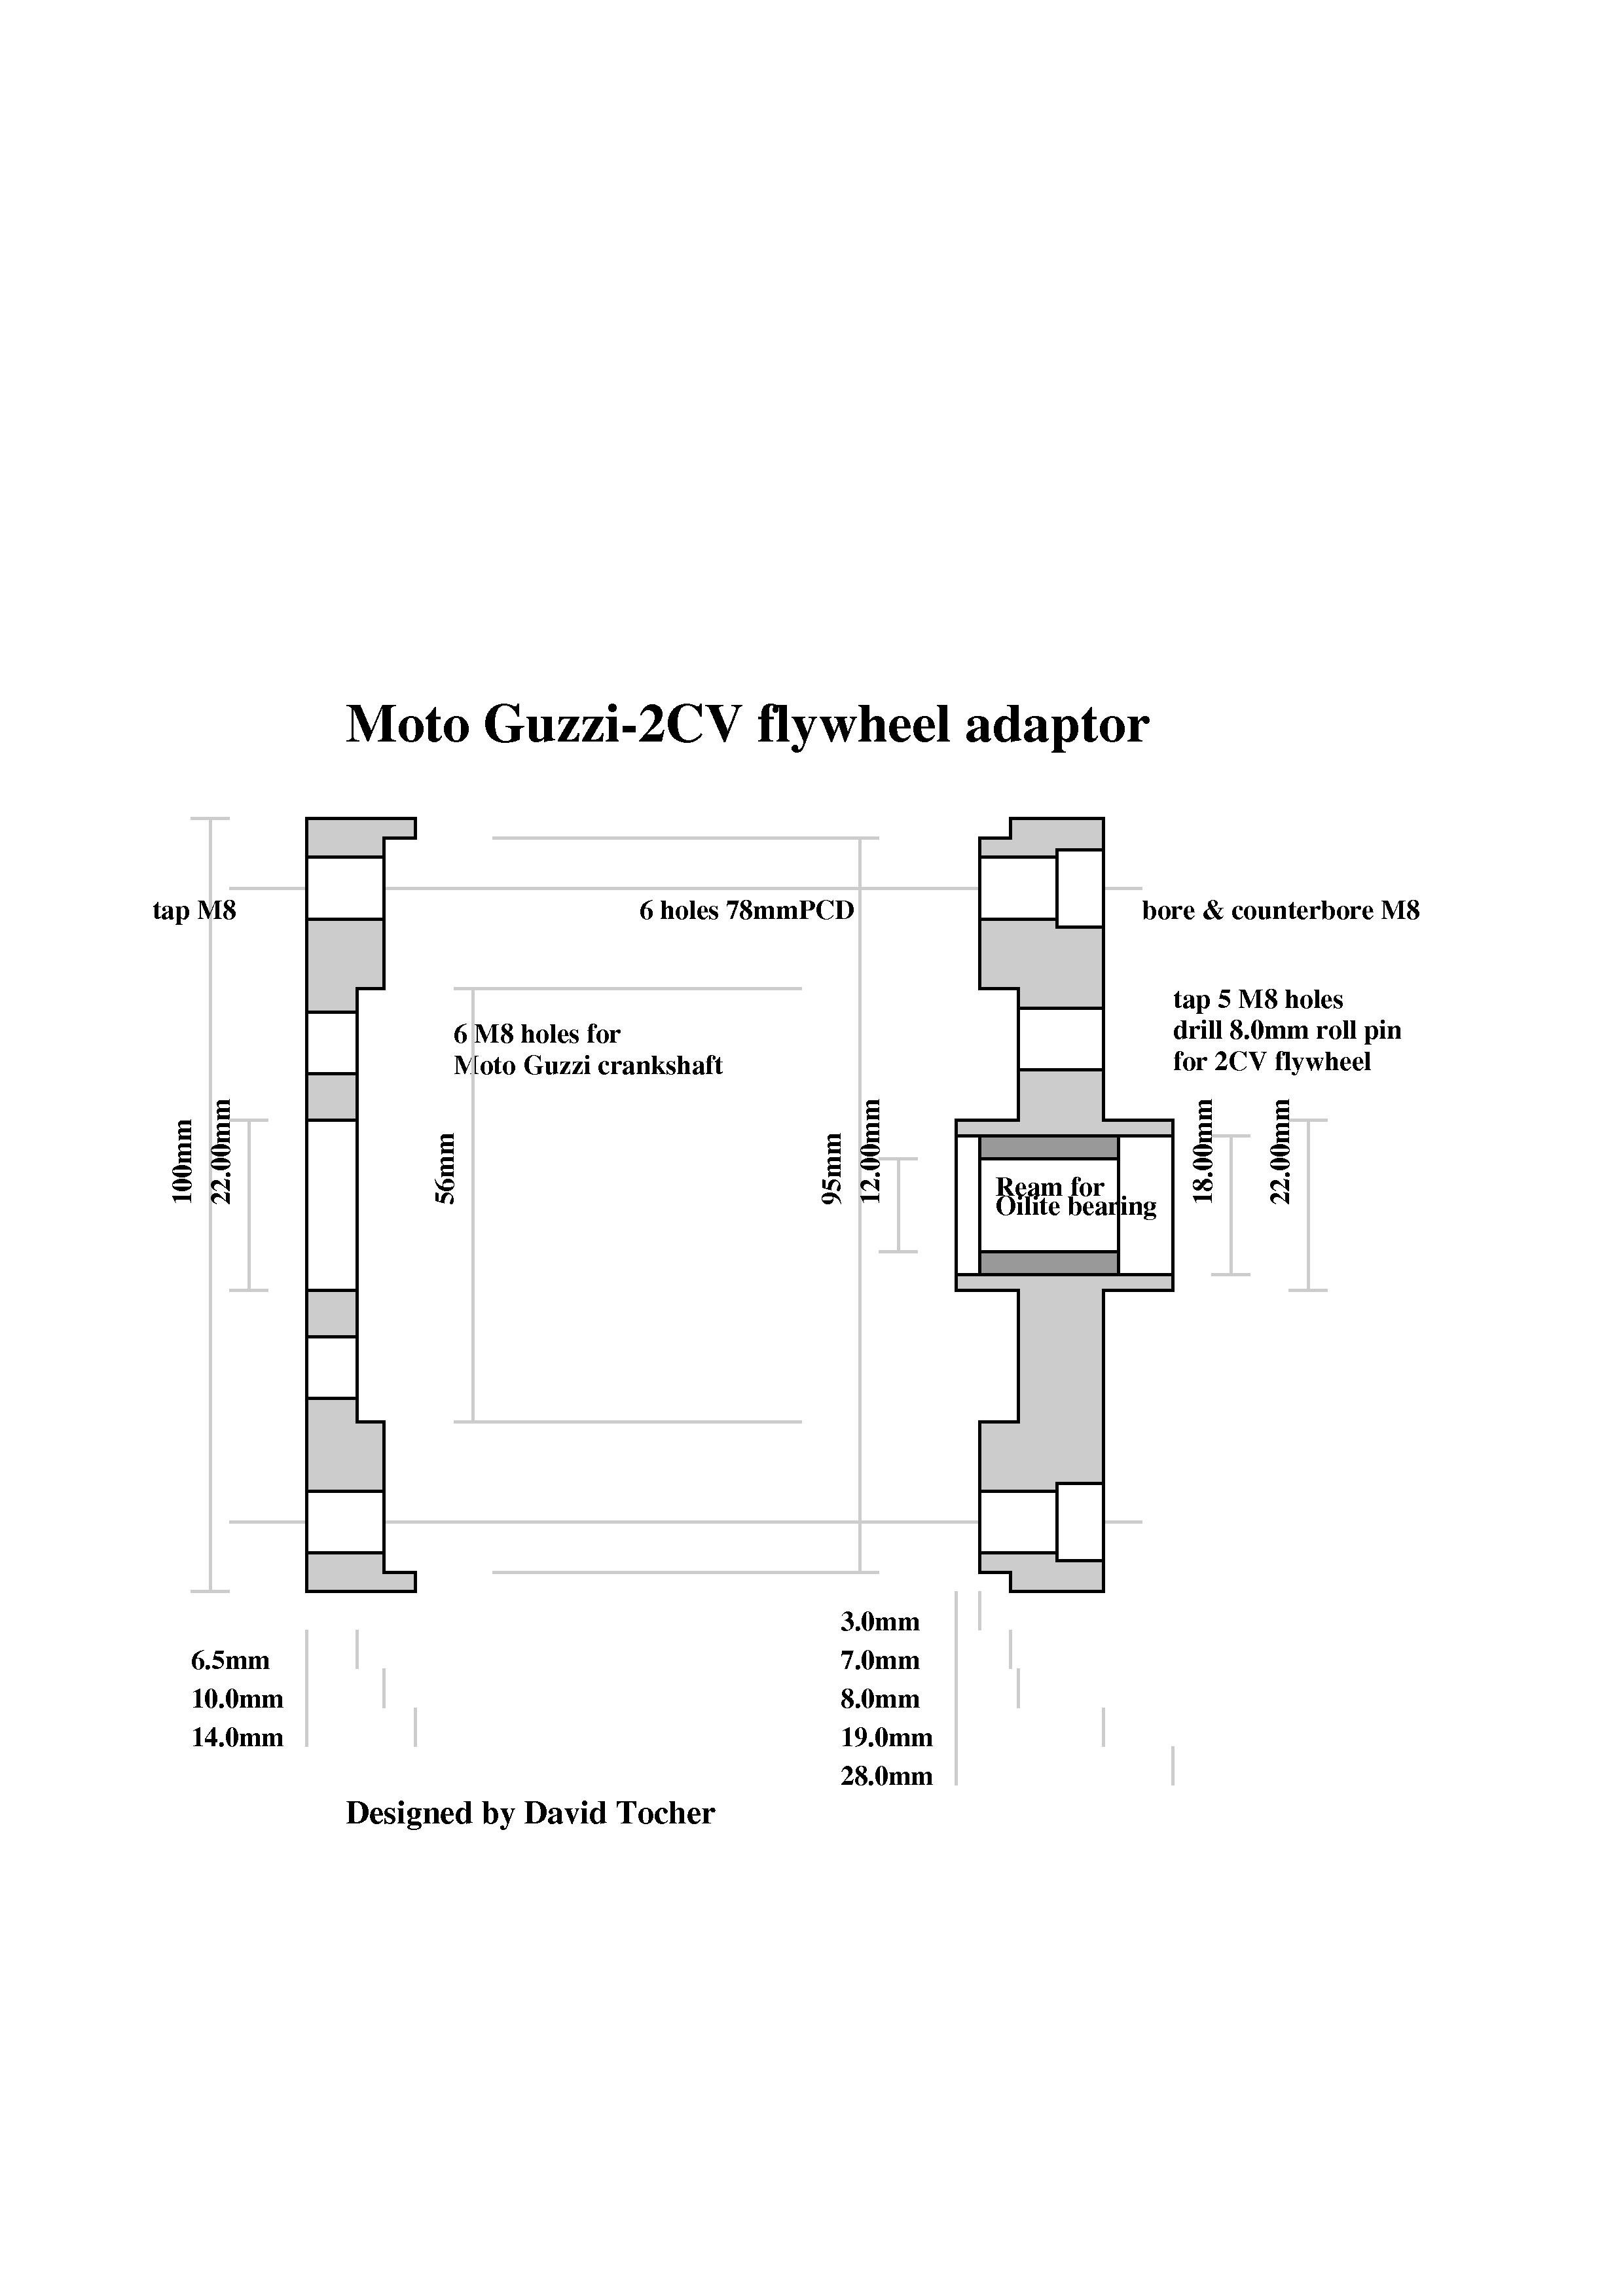 guzzi conversion click to enlarge